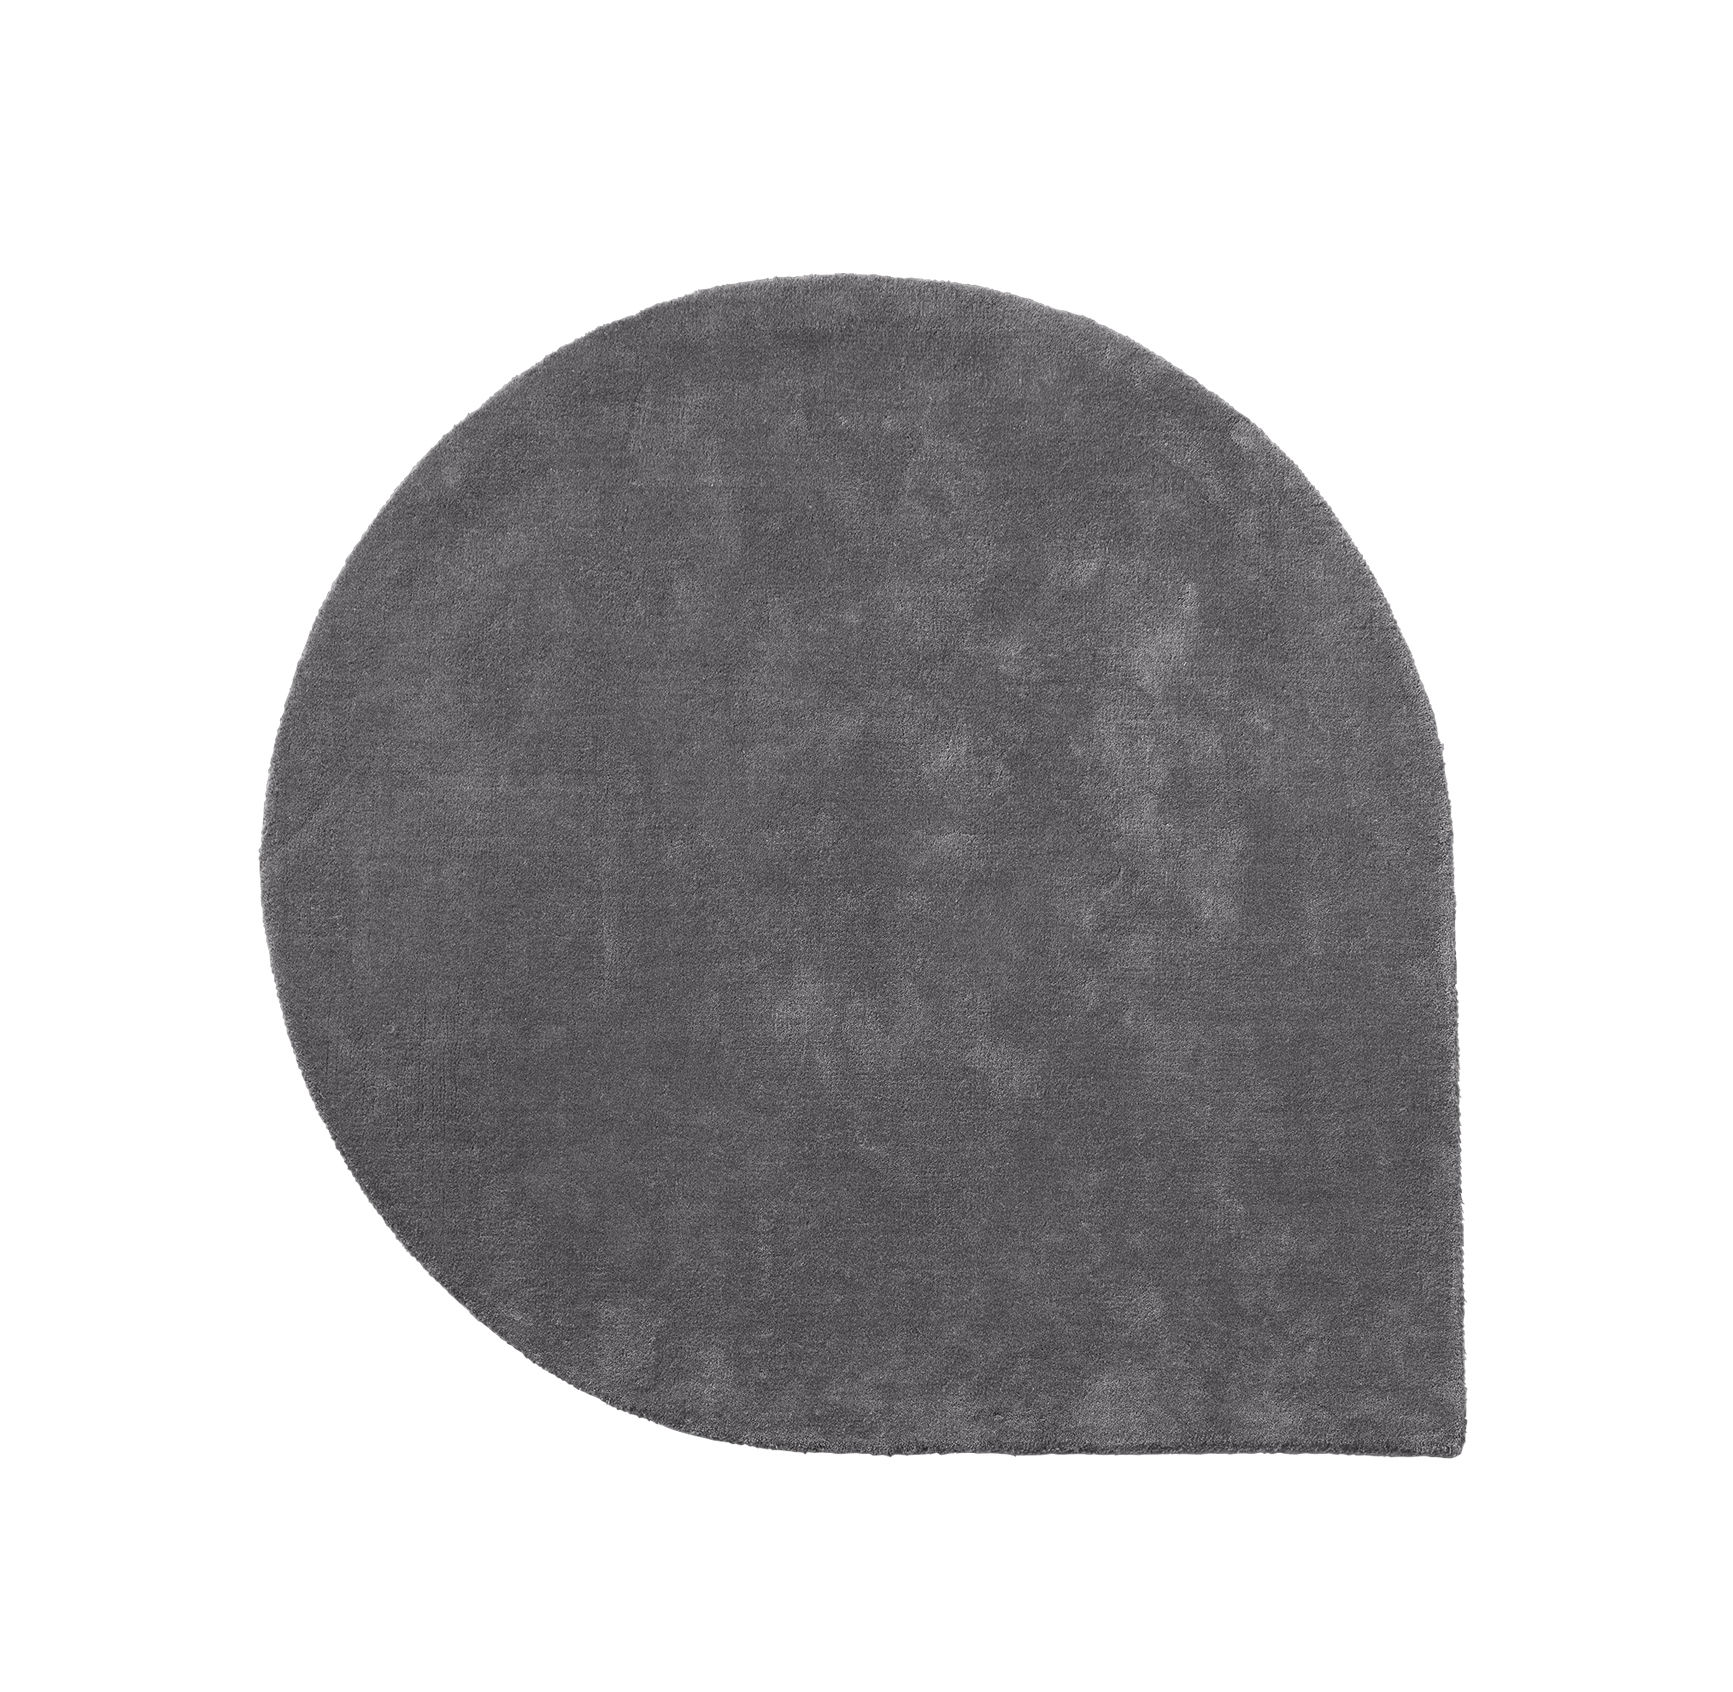 Tapis stilla 160 x 130 cm tuft main gris aytm - Made in design tapis ...